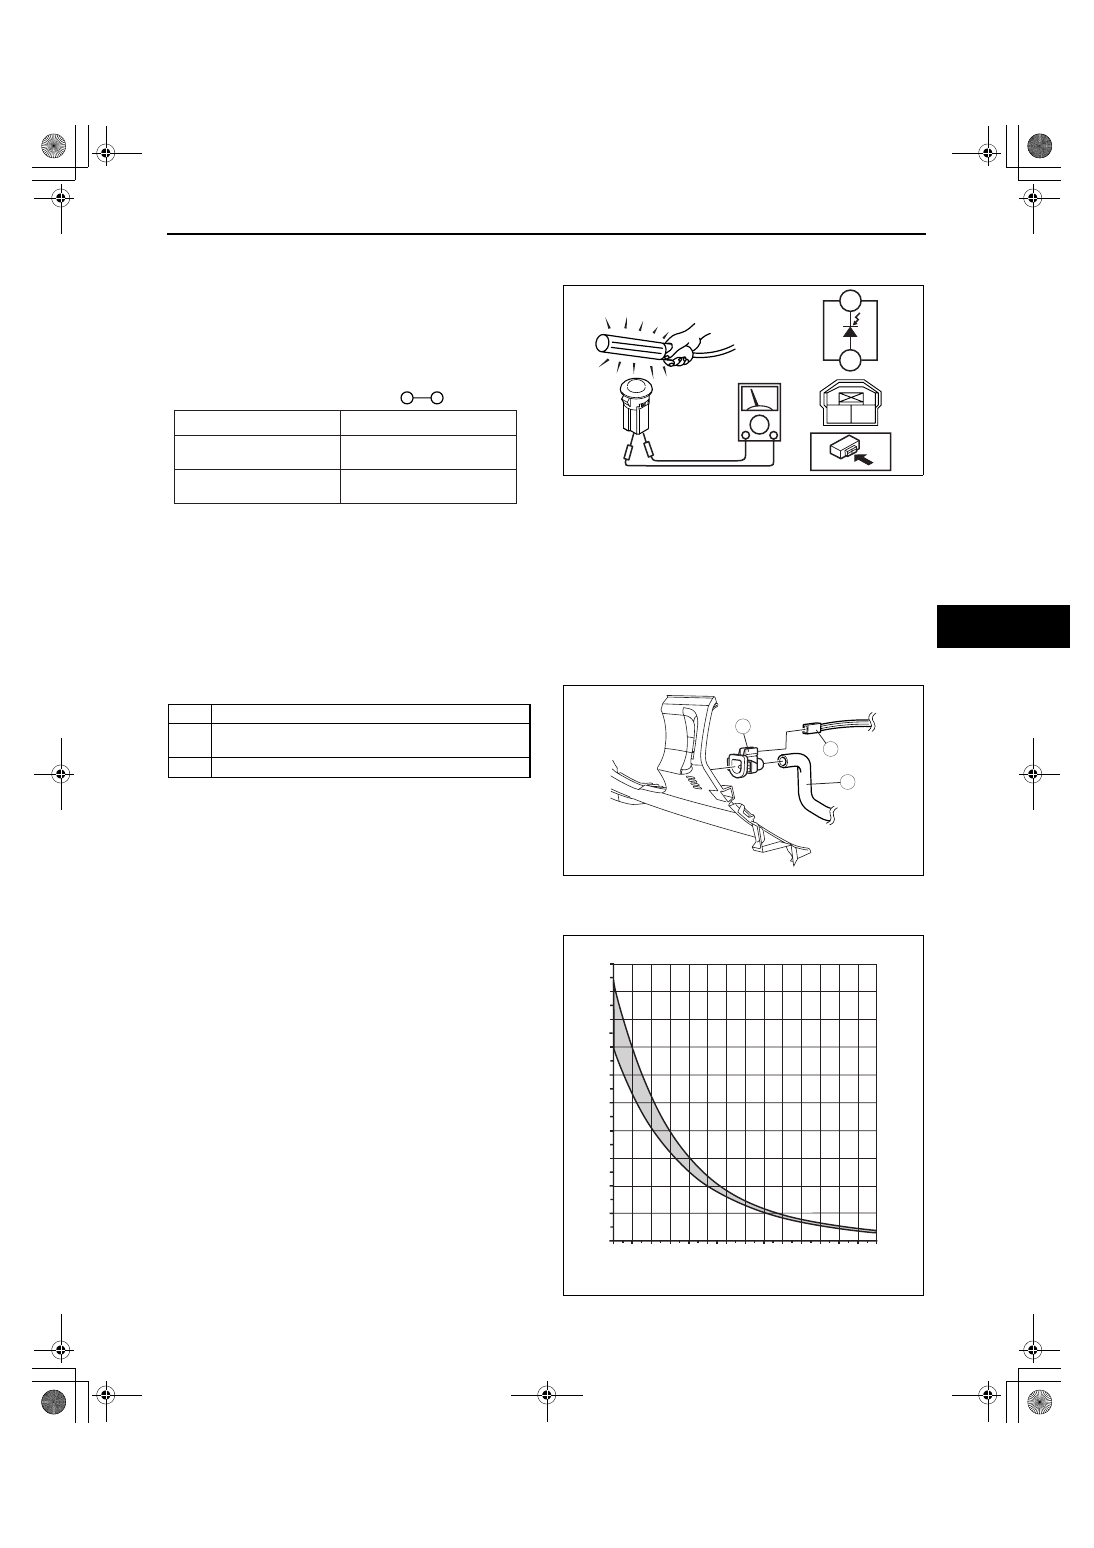 Mazda 3 Service Manual: Ambient Temperature Sensor RemovalInstallation Full Auto Air Conditioner